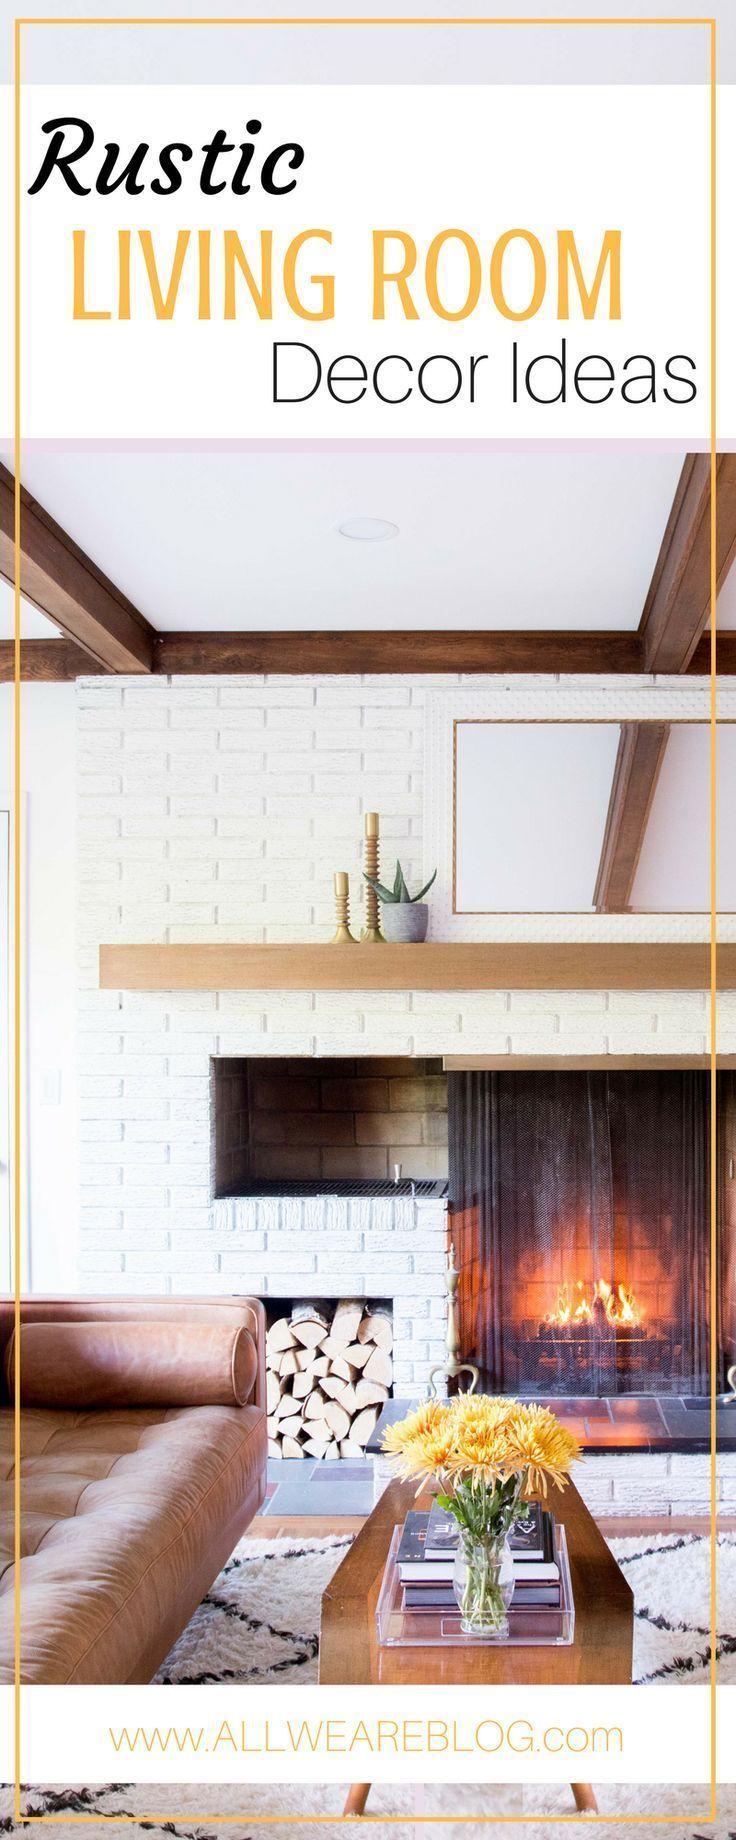 rustic living room ideas on allweareblog.com ...